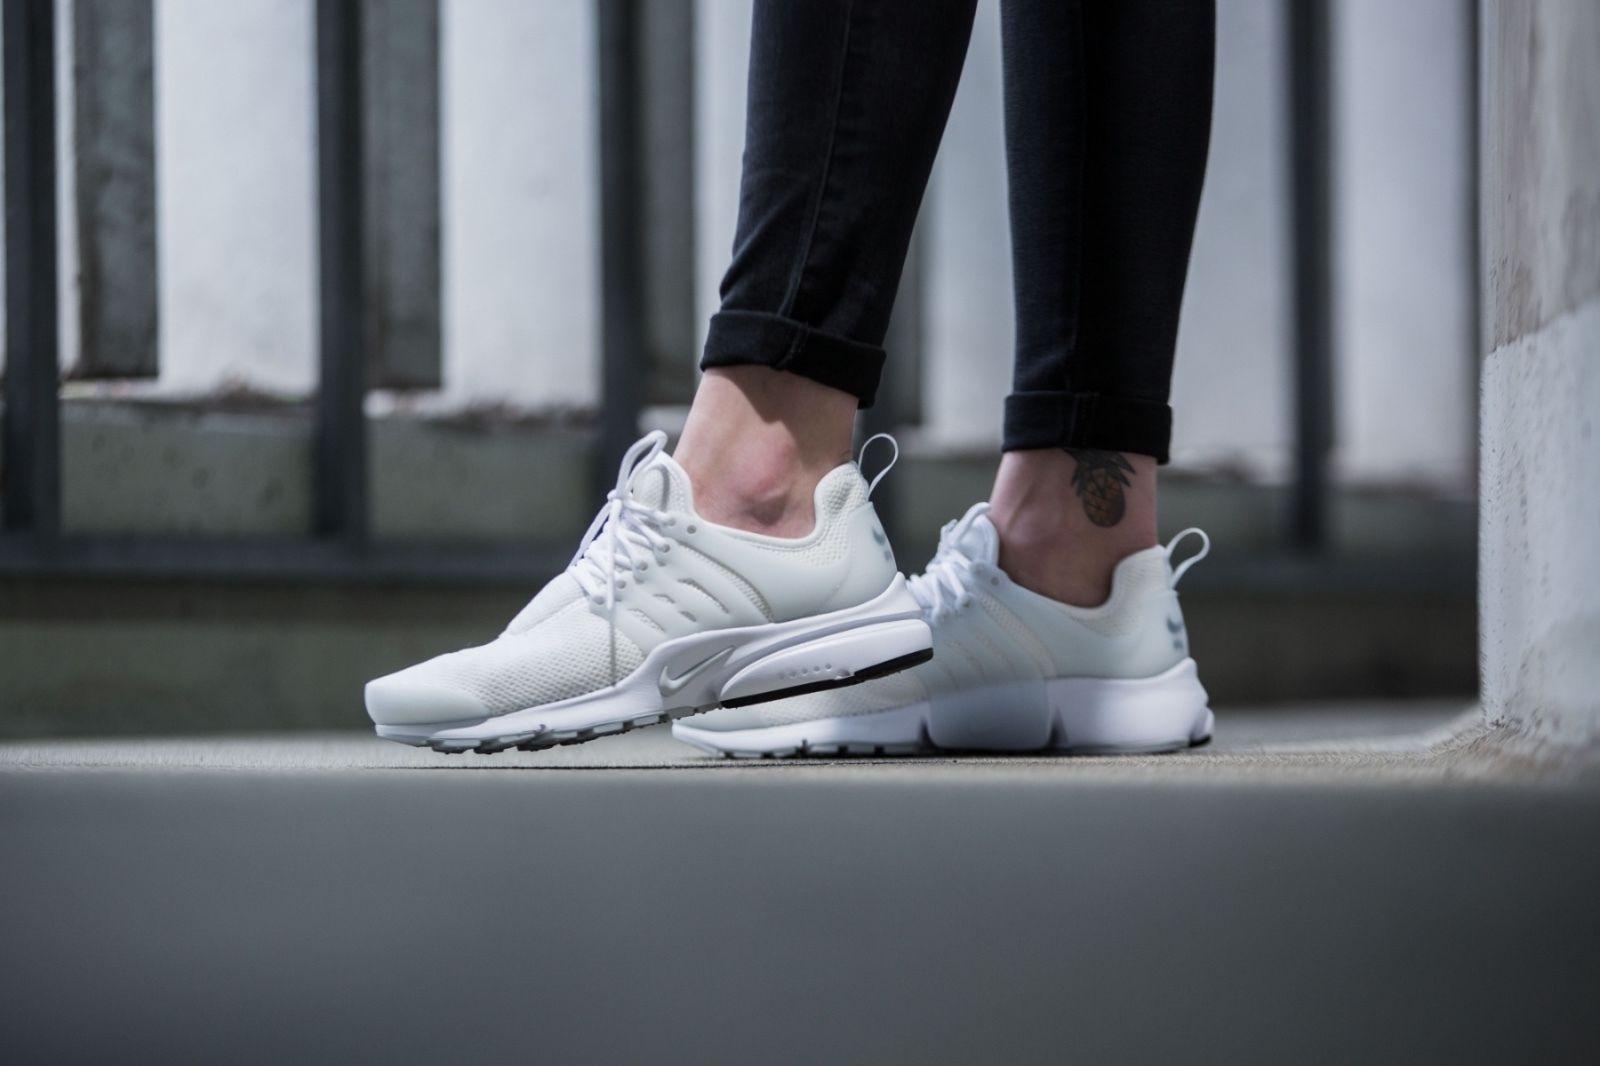 Nike Air Presto White/Pure Platinum 878068-100 Women's Shoe Size 7